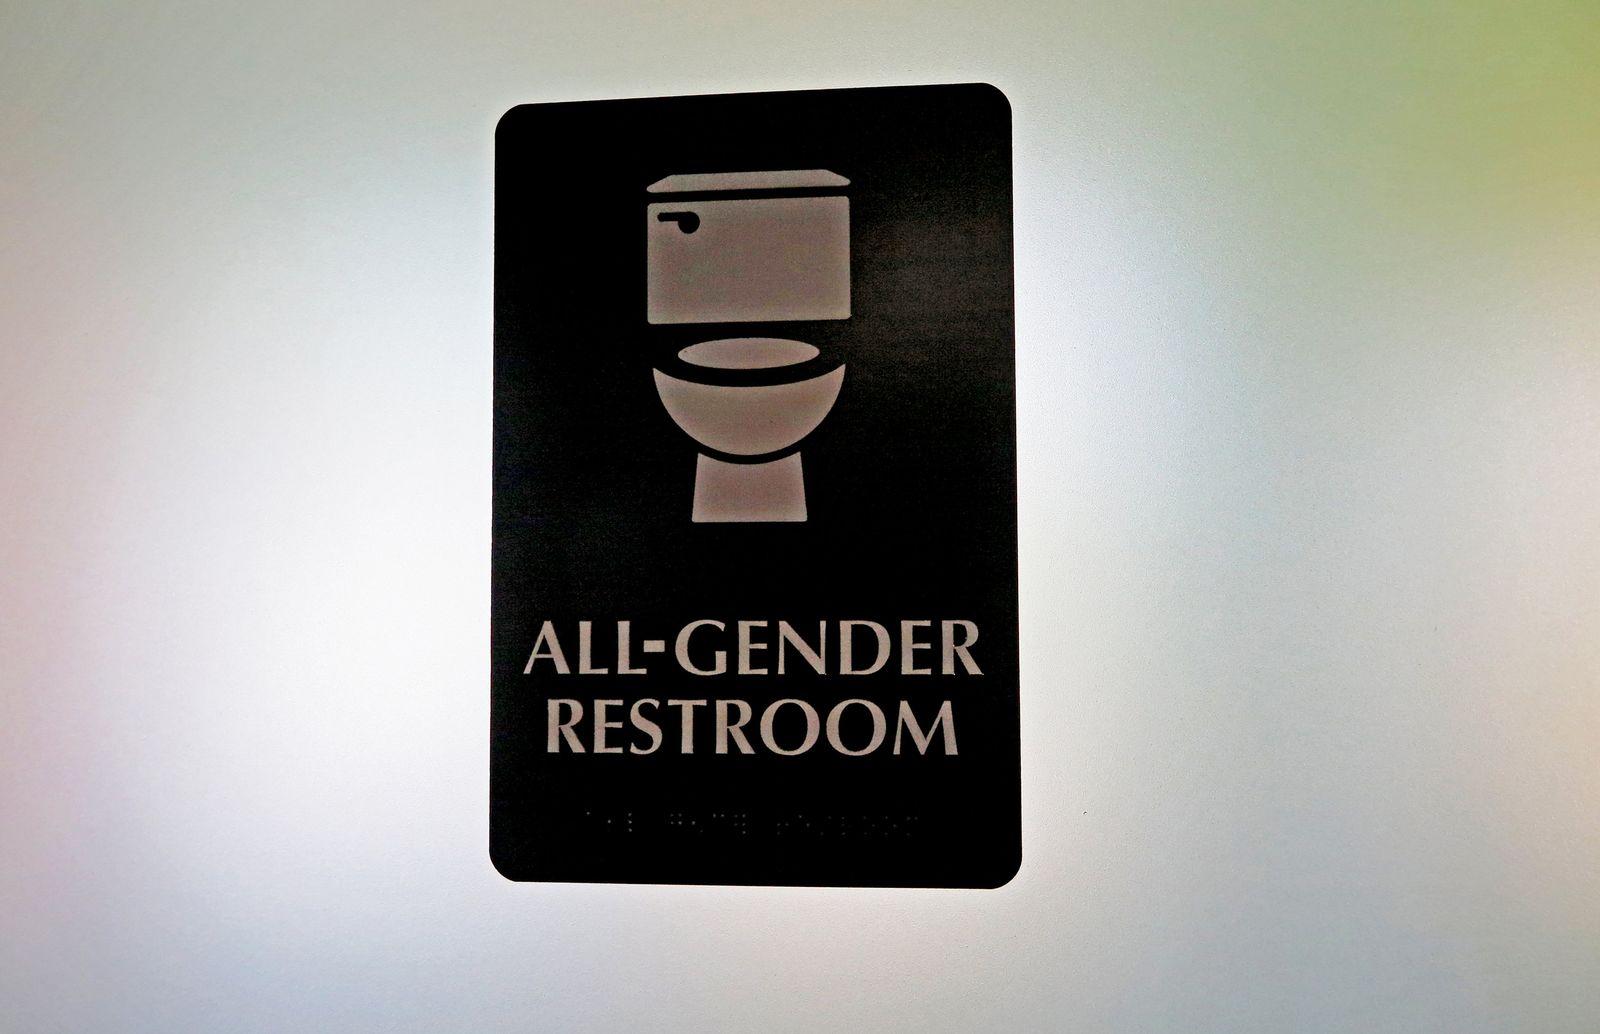 Toilettengesetz/North Carolina